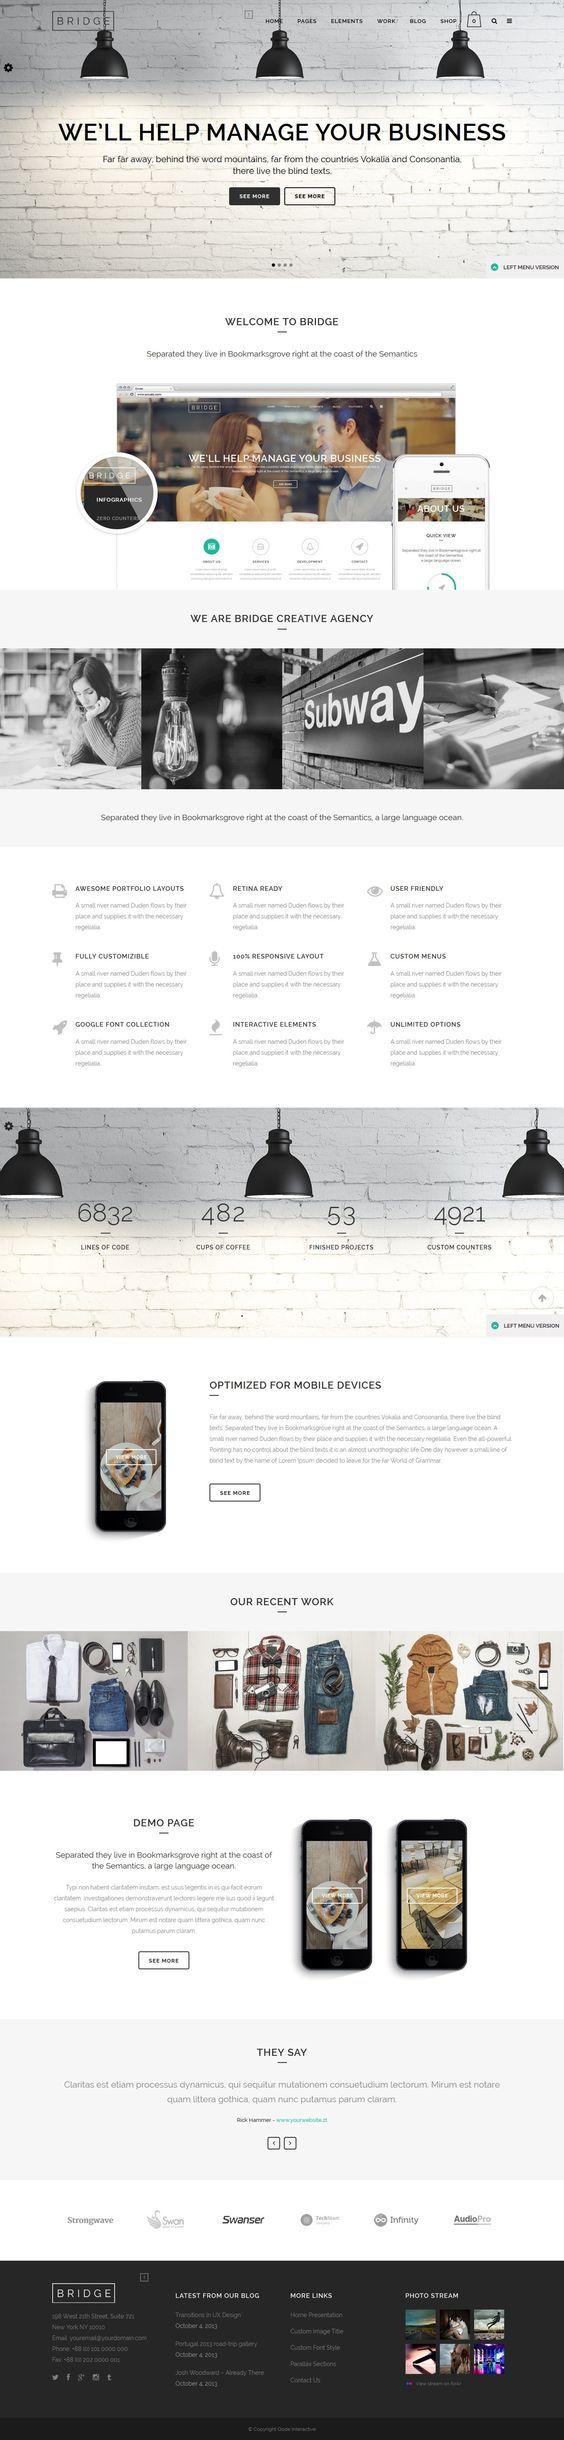 12+ Best CreAtive Onepage WordPress Themes 2014 #web #design #wordpress: